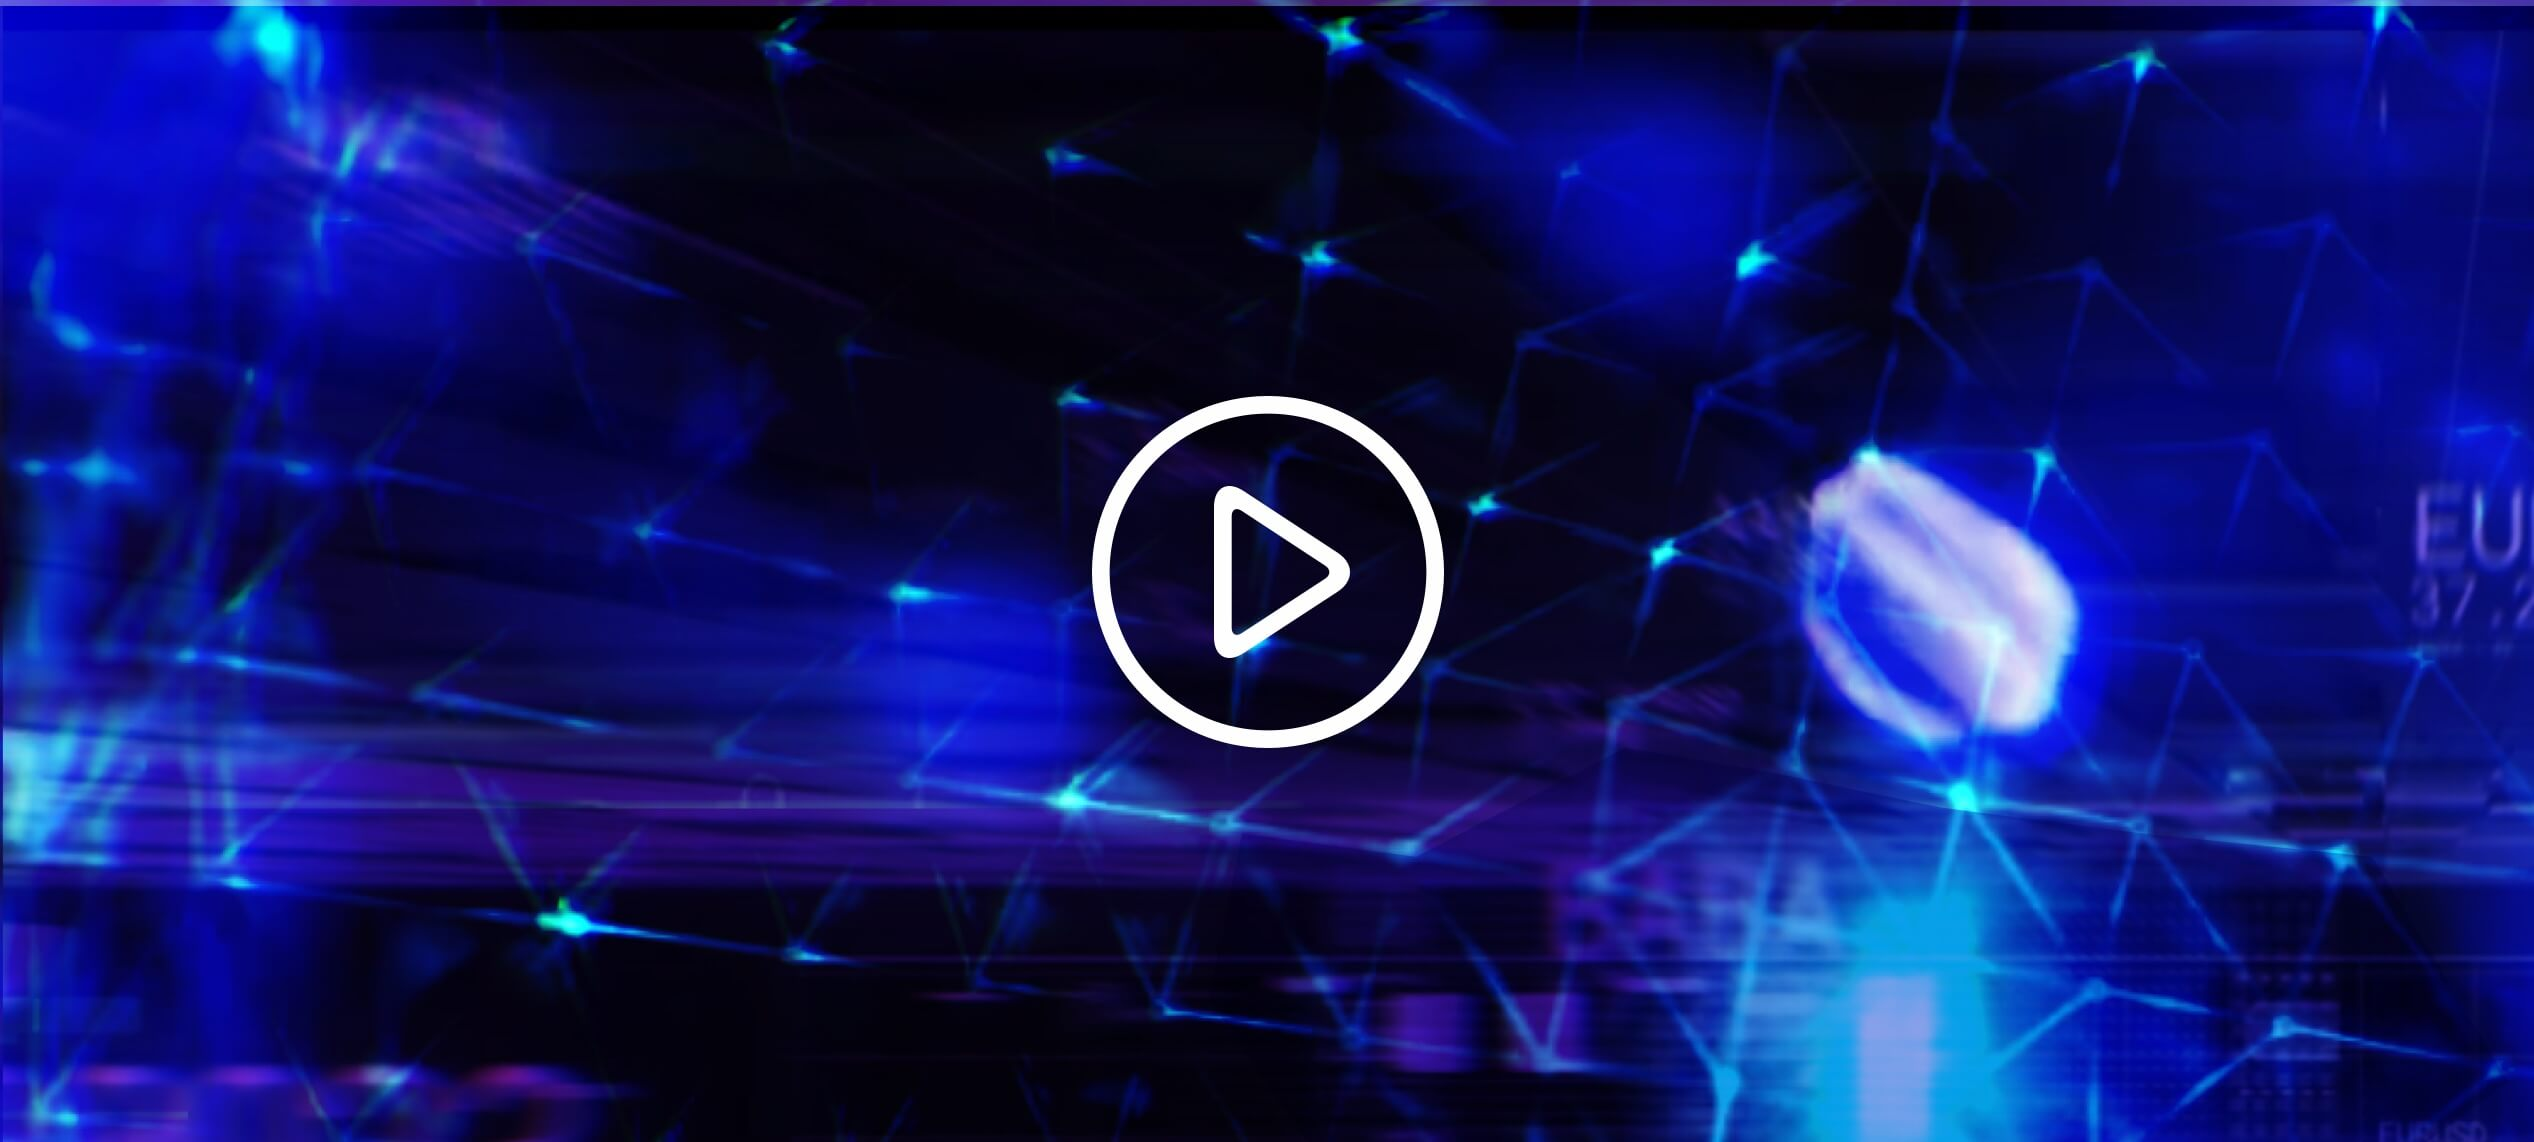 Cindicator Company Play Video